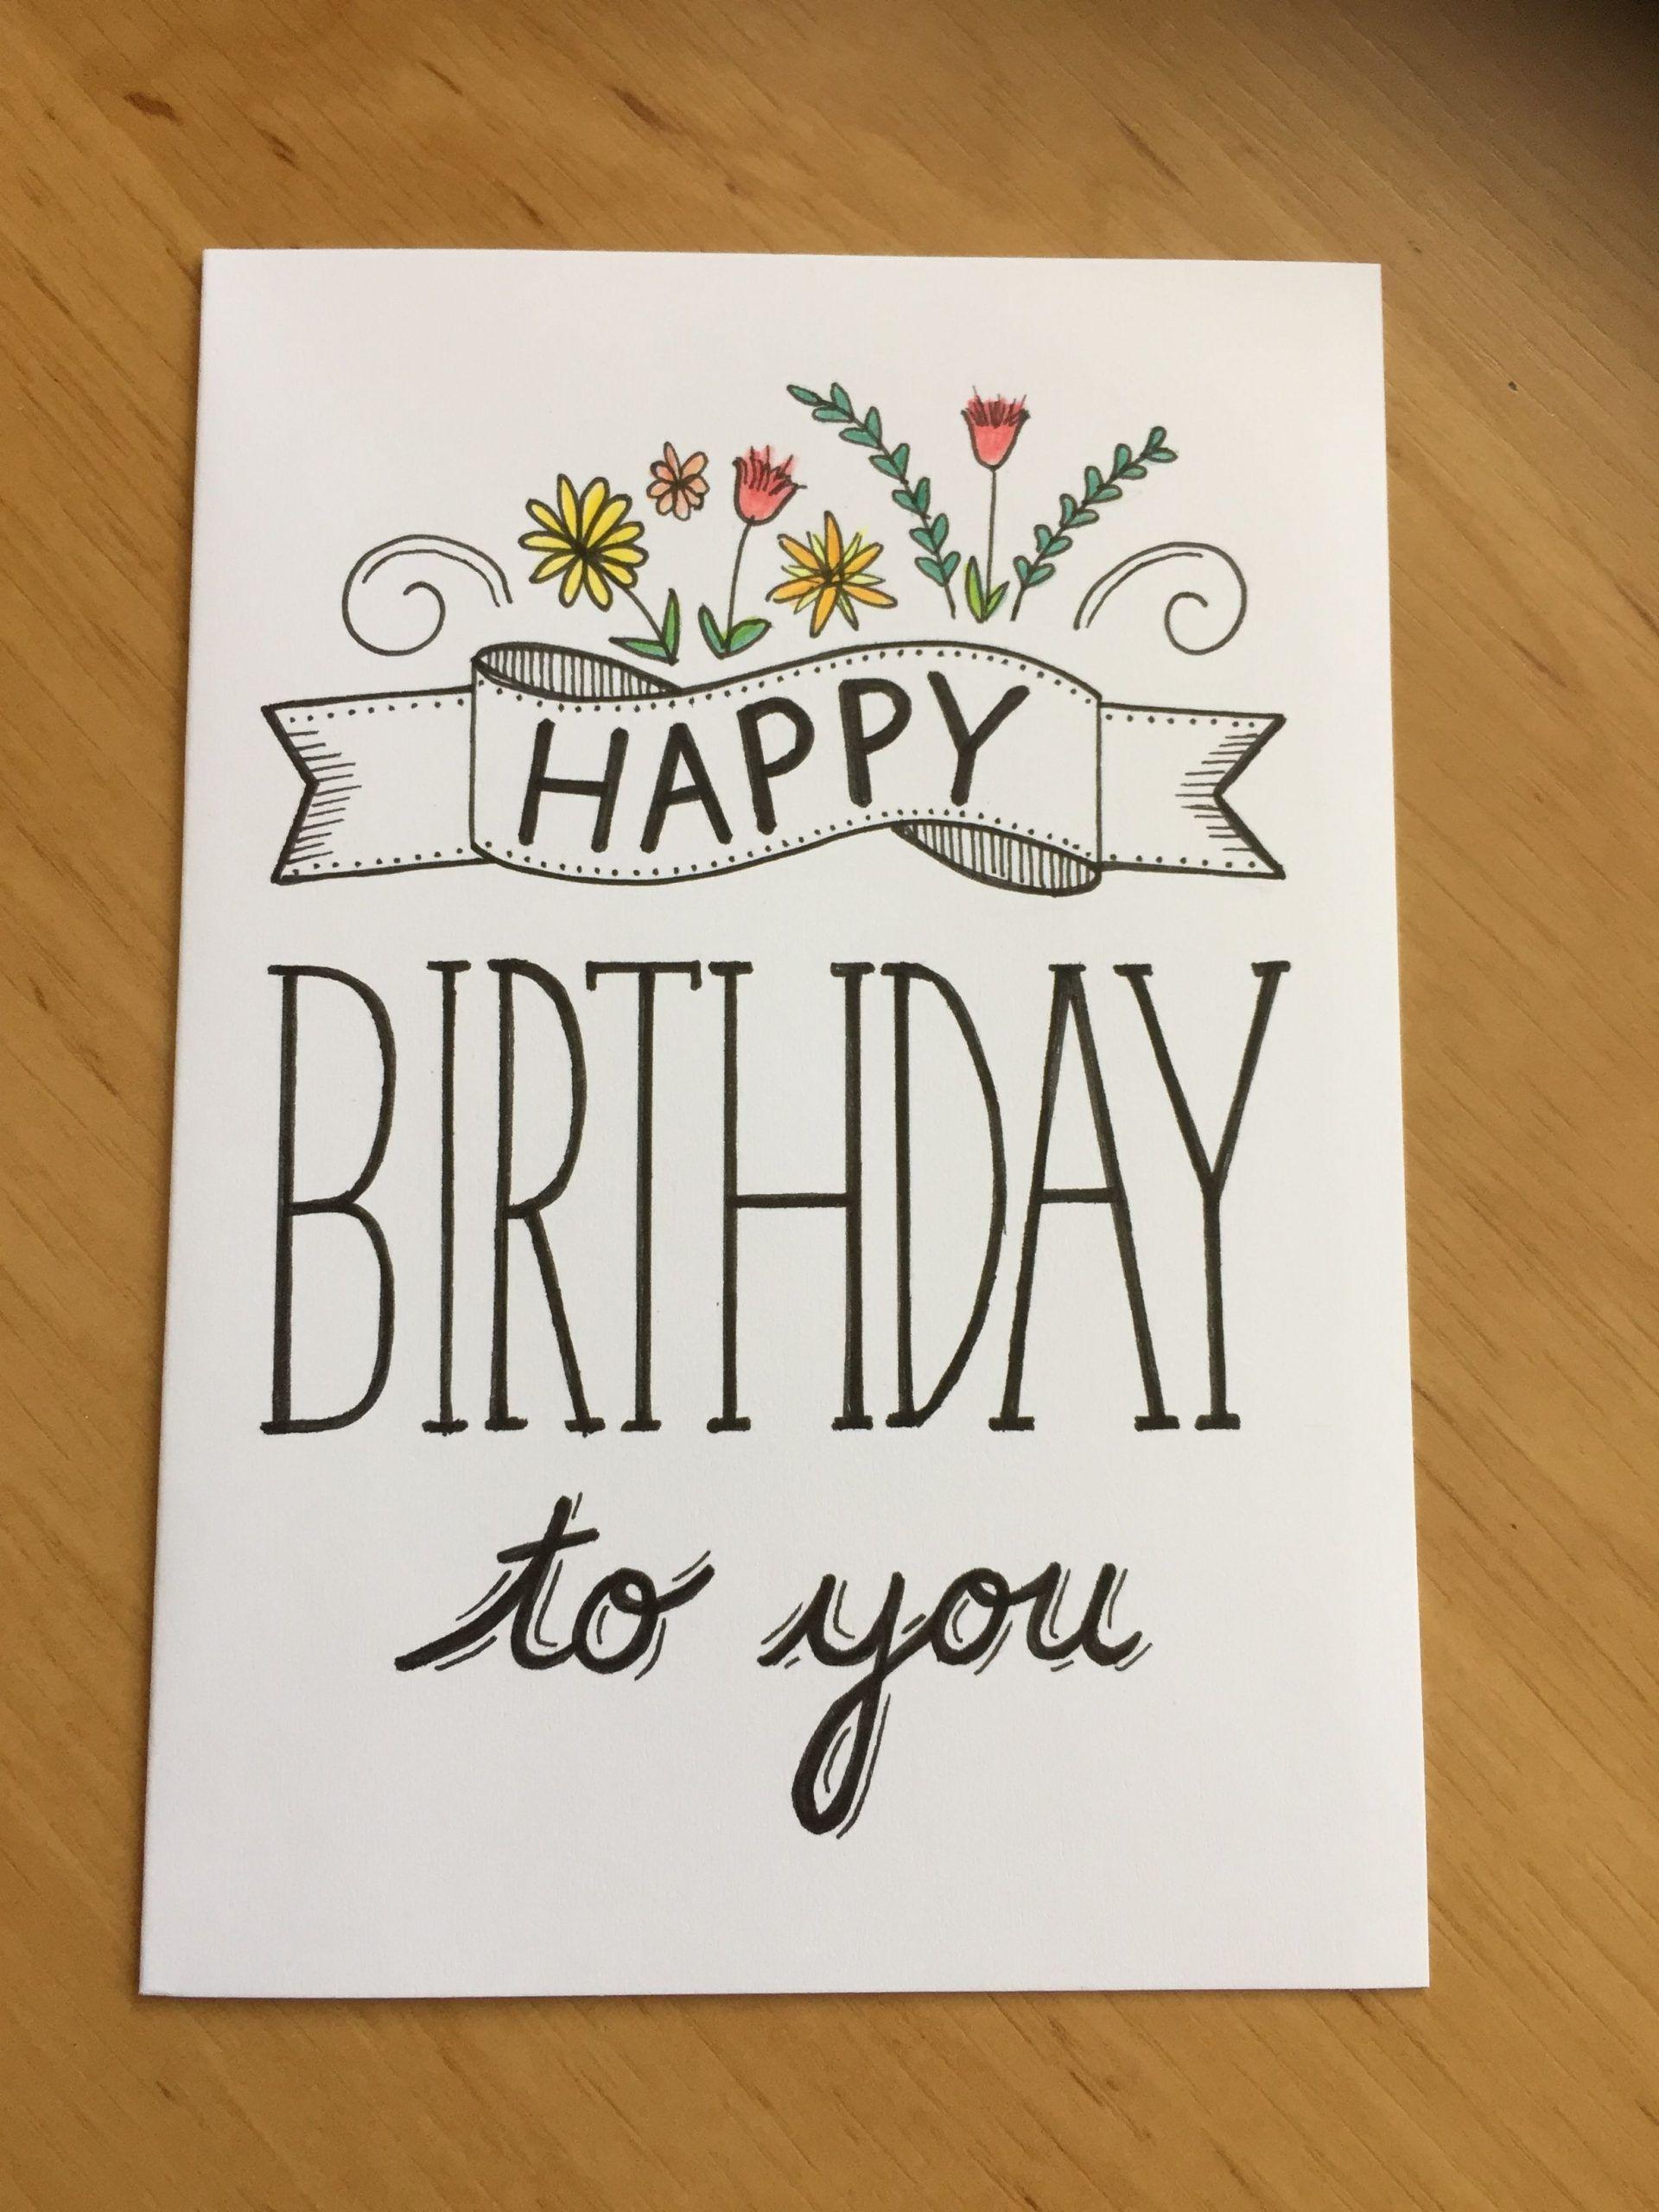 Terrific Birthday Present In 2020 Birthday Card Craft Creative Birthday Funny Birthday Cards Online Alyptdamsfinfo